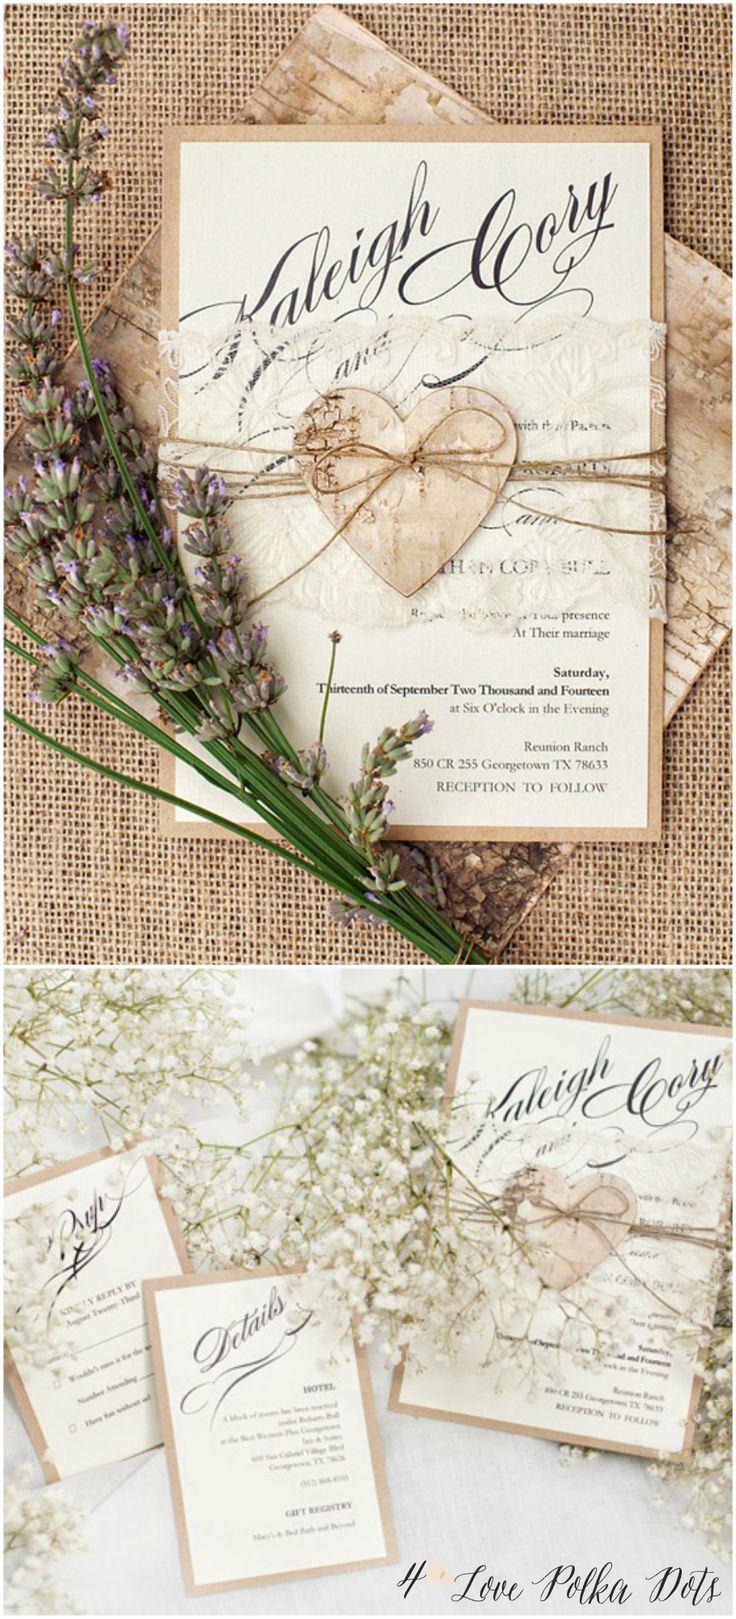 Romantic Rustic Lace Wedding Invitations With Birch Bark Heart #rustic  #romantic #eco #